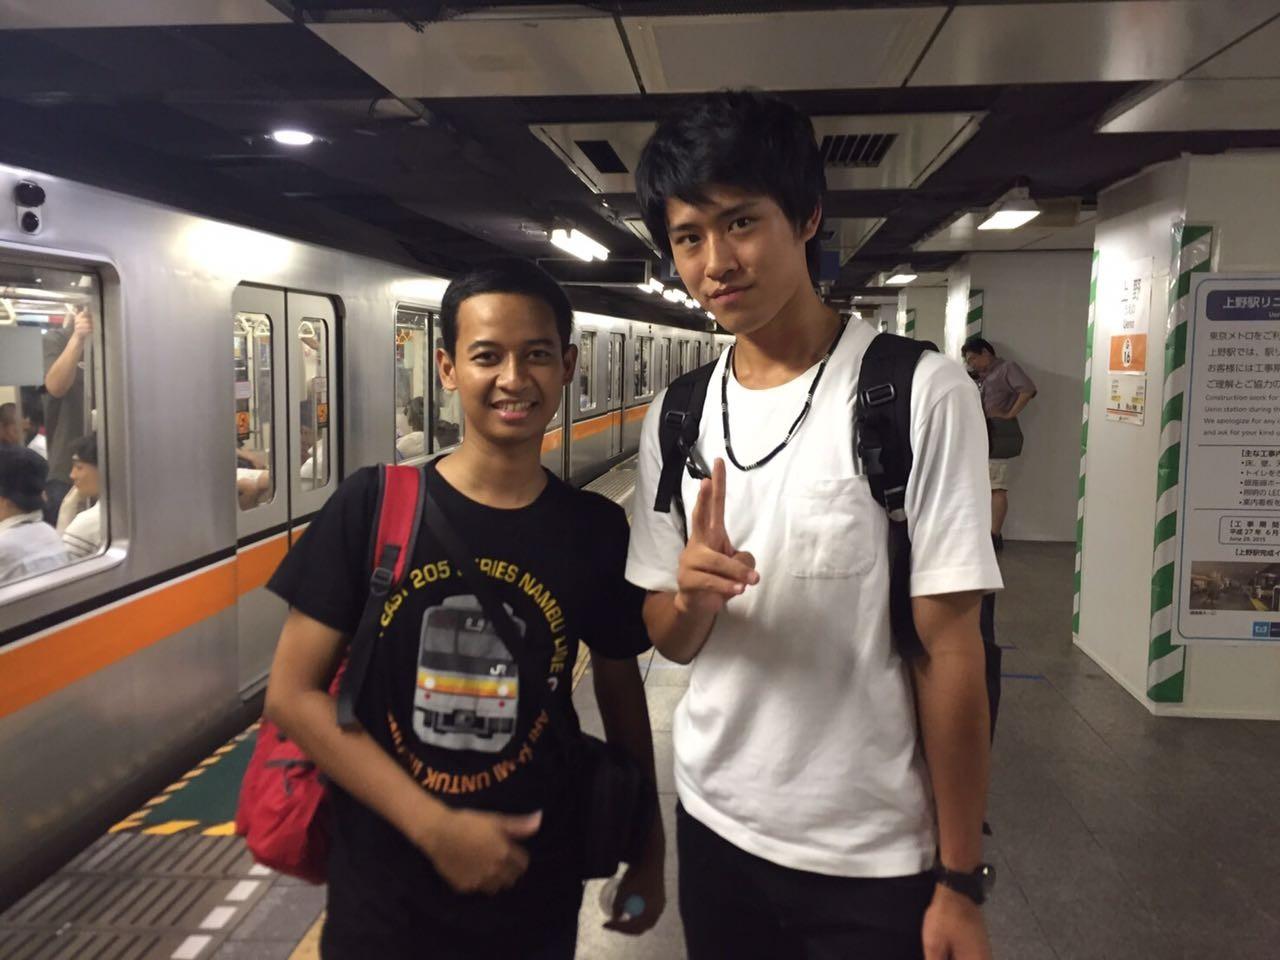 Train worker returning phone becomes international news